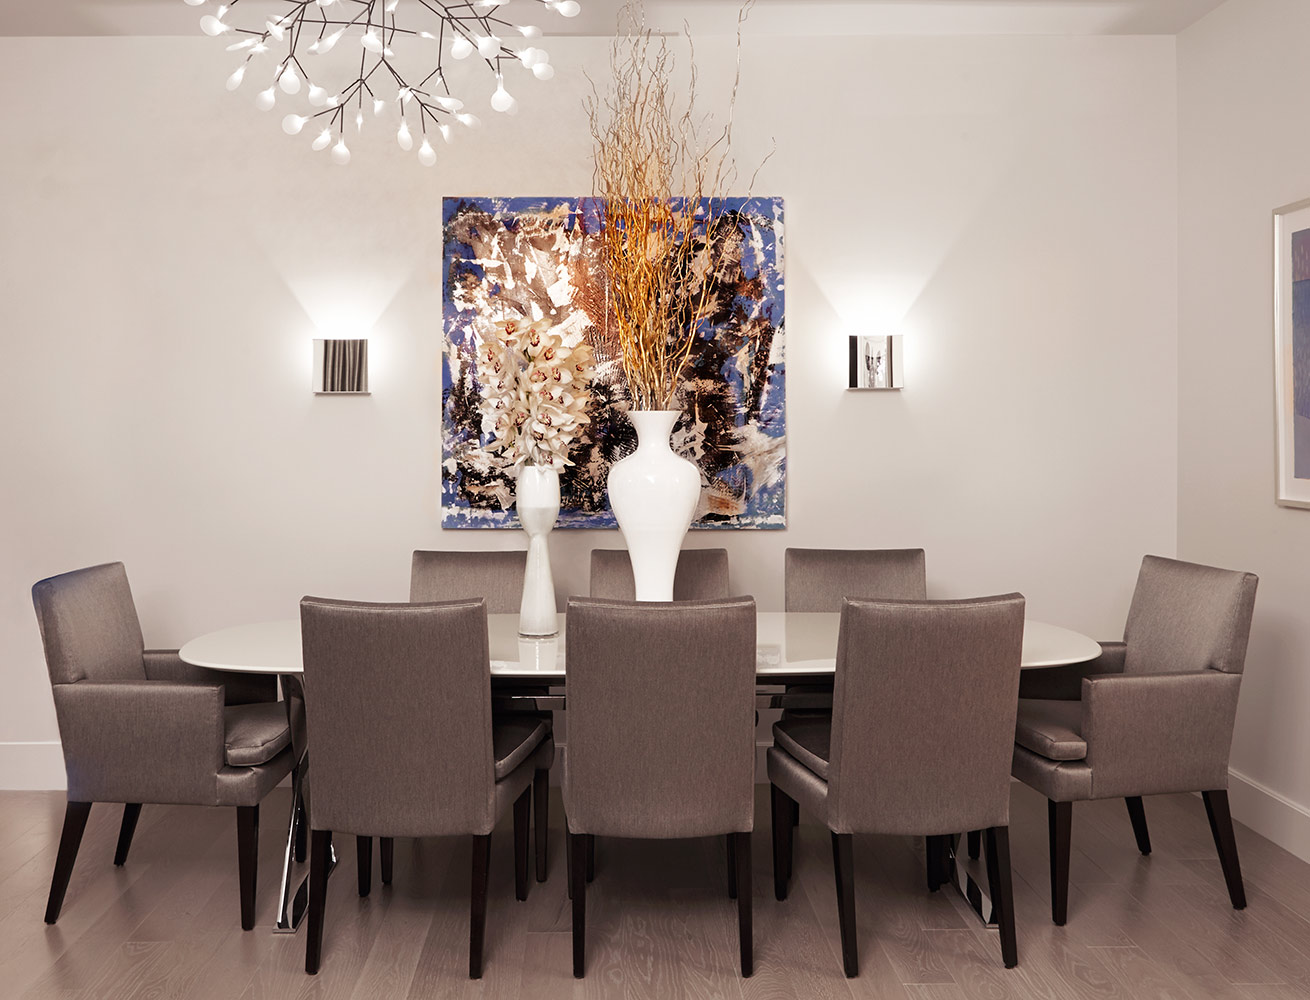 wFN02-Dinning-Room1355-1ST-AVE-NYC_SANTOPIETRO_73.jpg